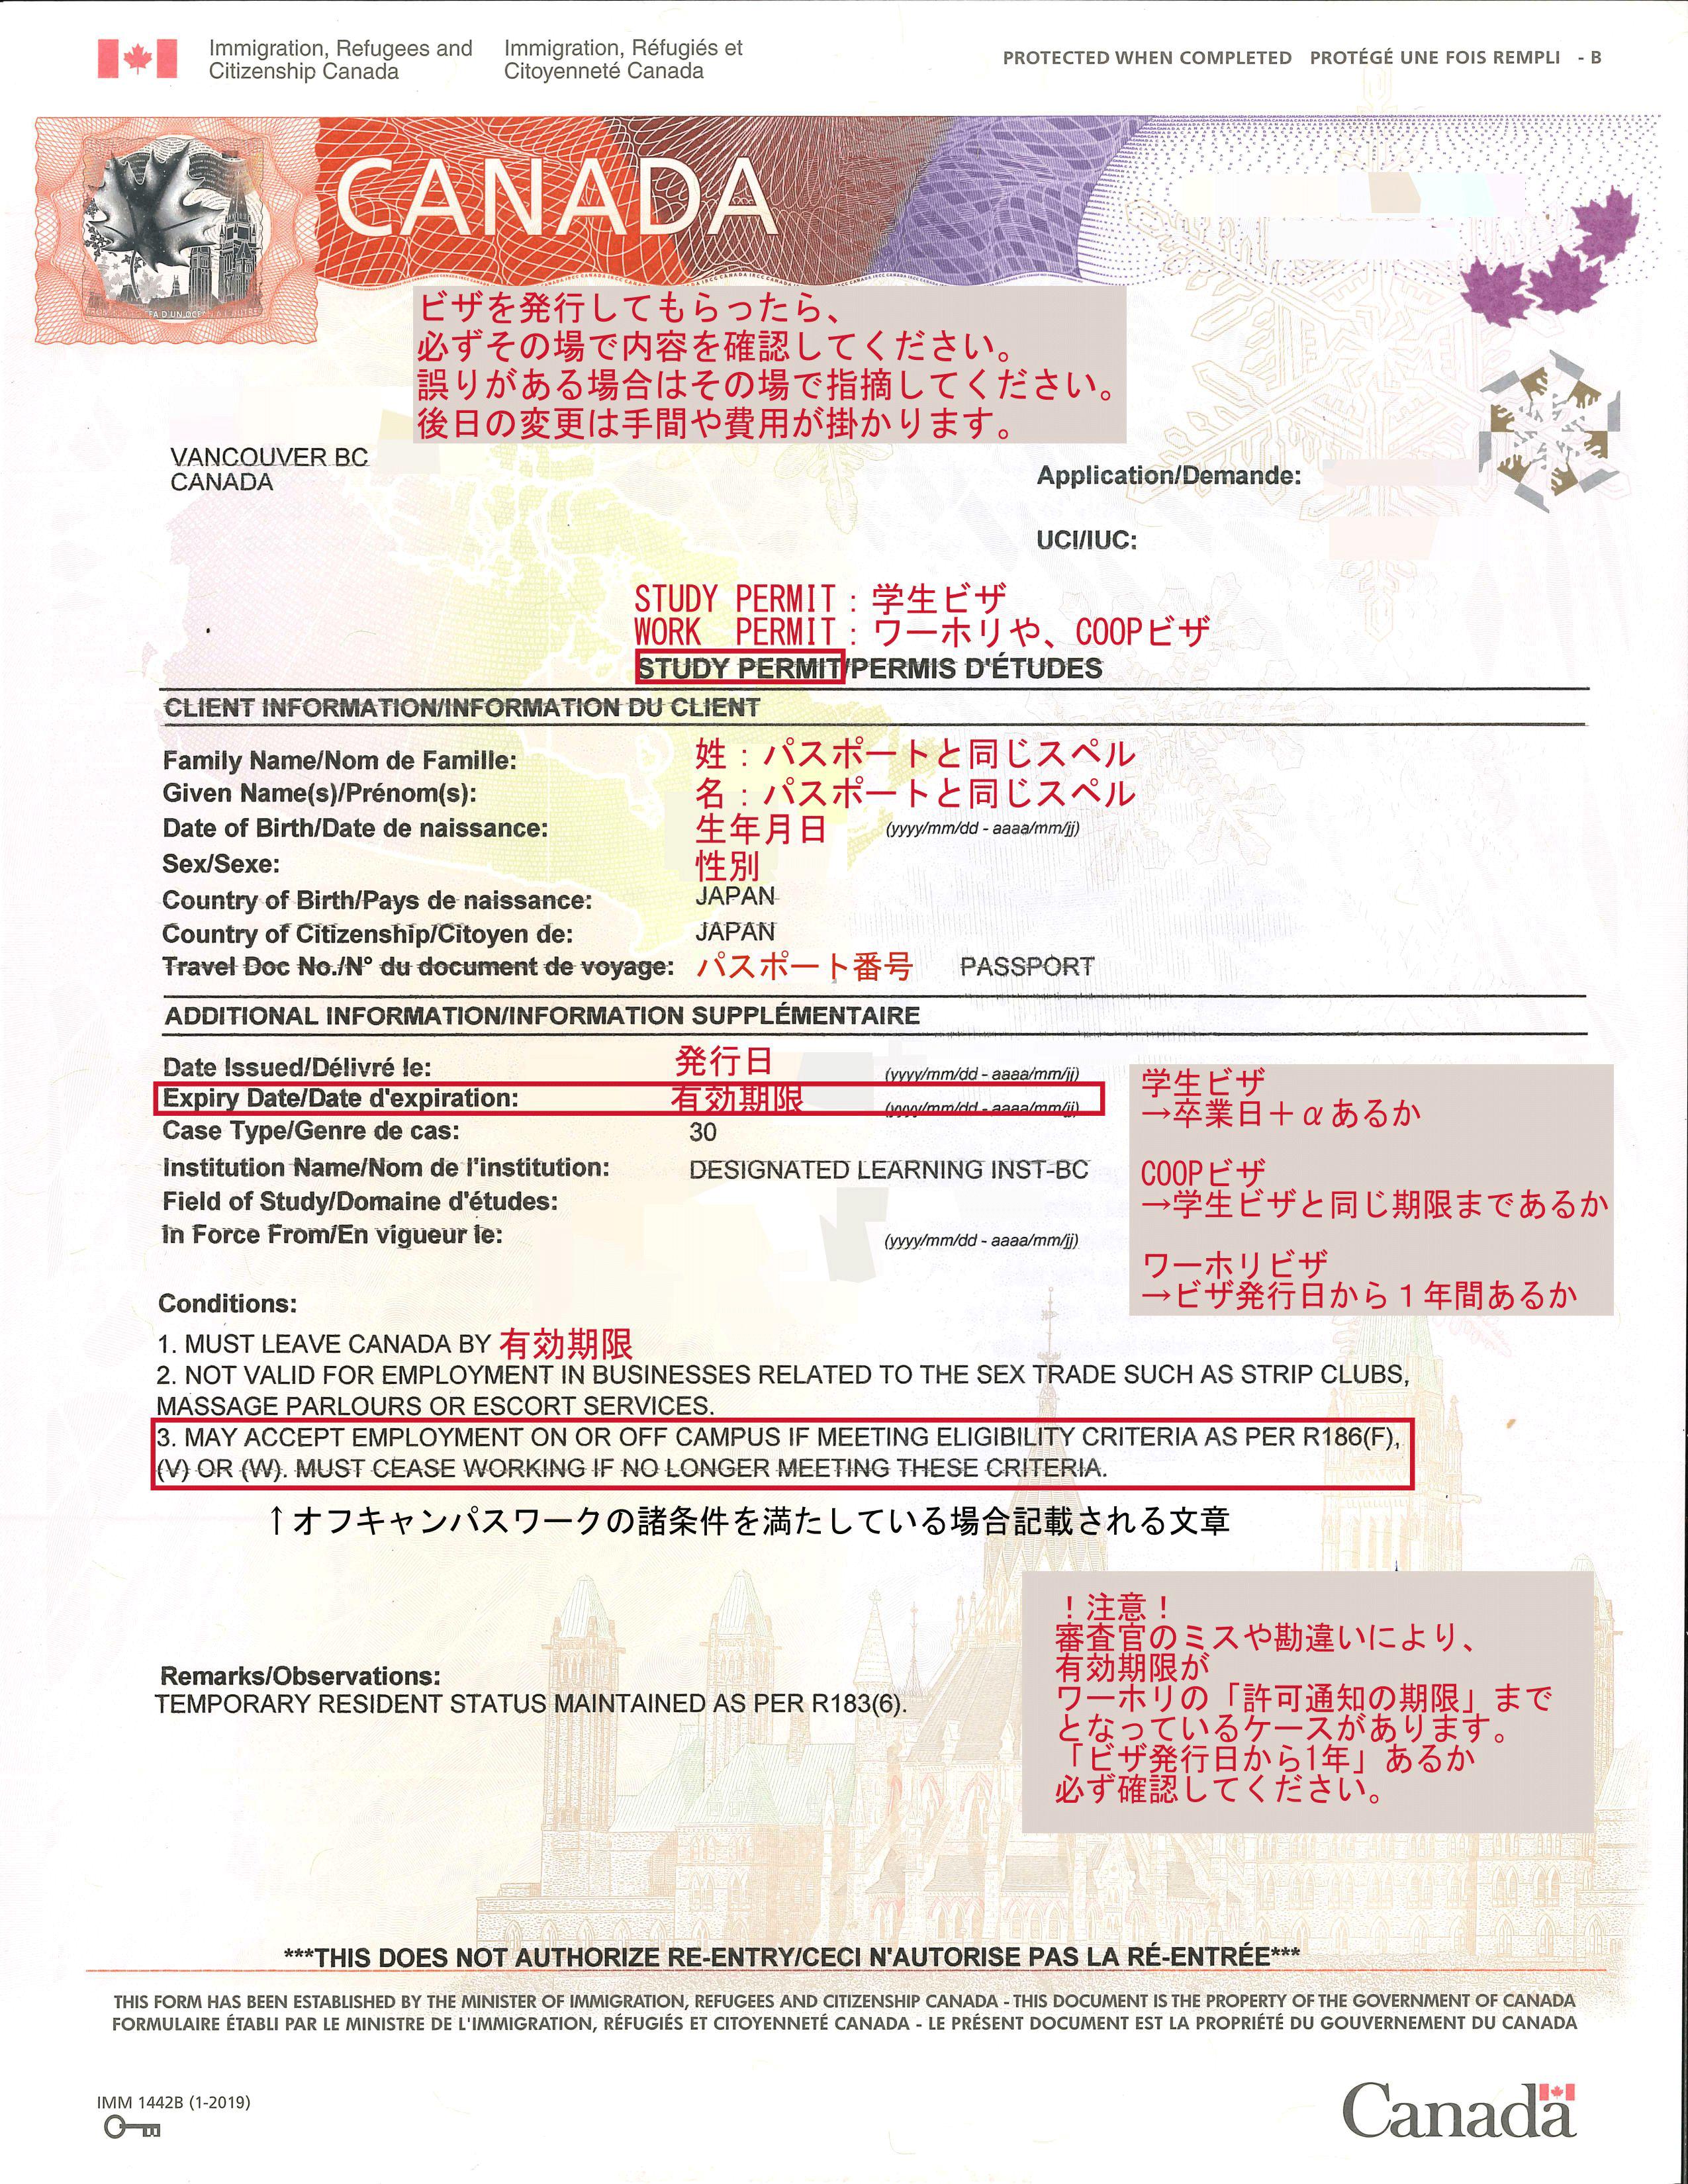 YVR空港入国審査・ビザ